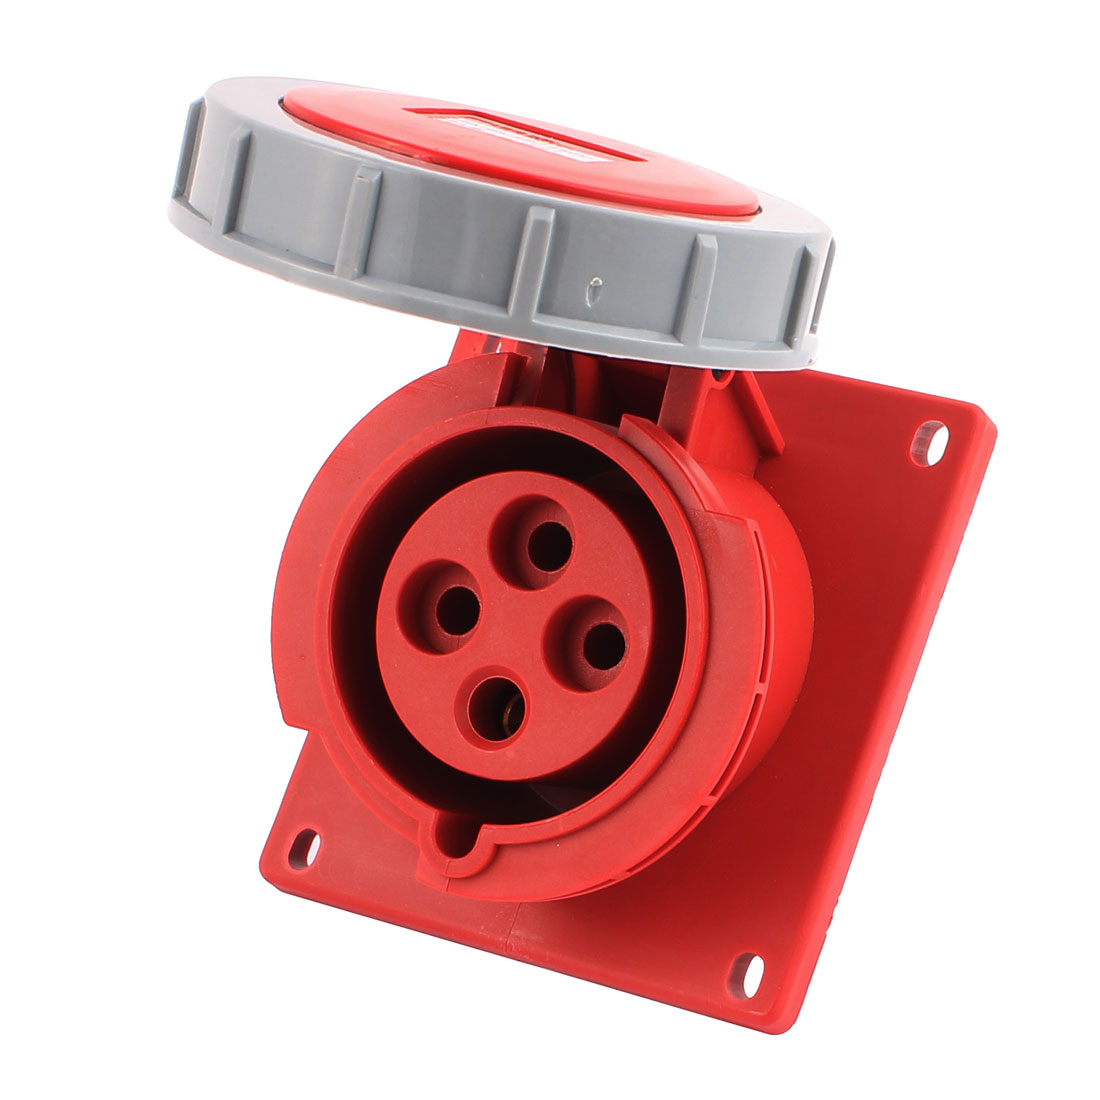 AC 380V-450V 32A IP67 3P+E 4P Female Industrial Consealing Oblique Socket